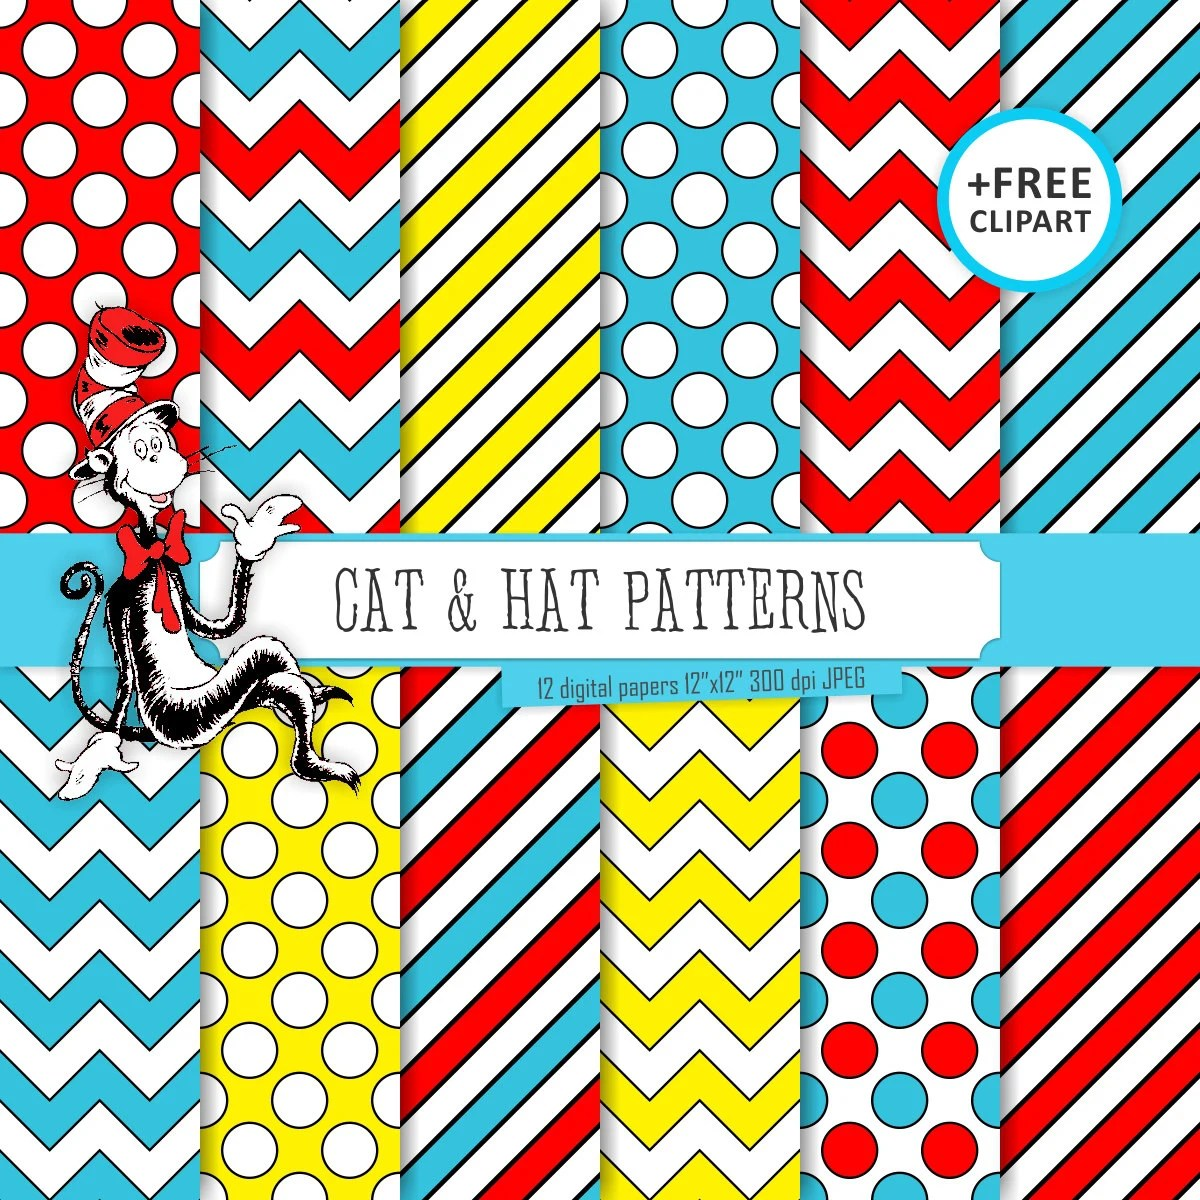 Buy 2 Get 1 Free Digital Paper Cat Amp Hat Patterns Blue Red